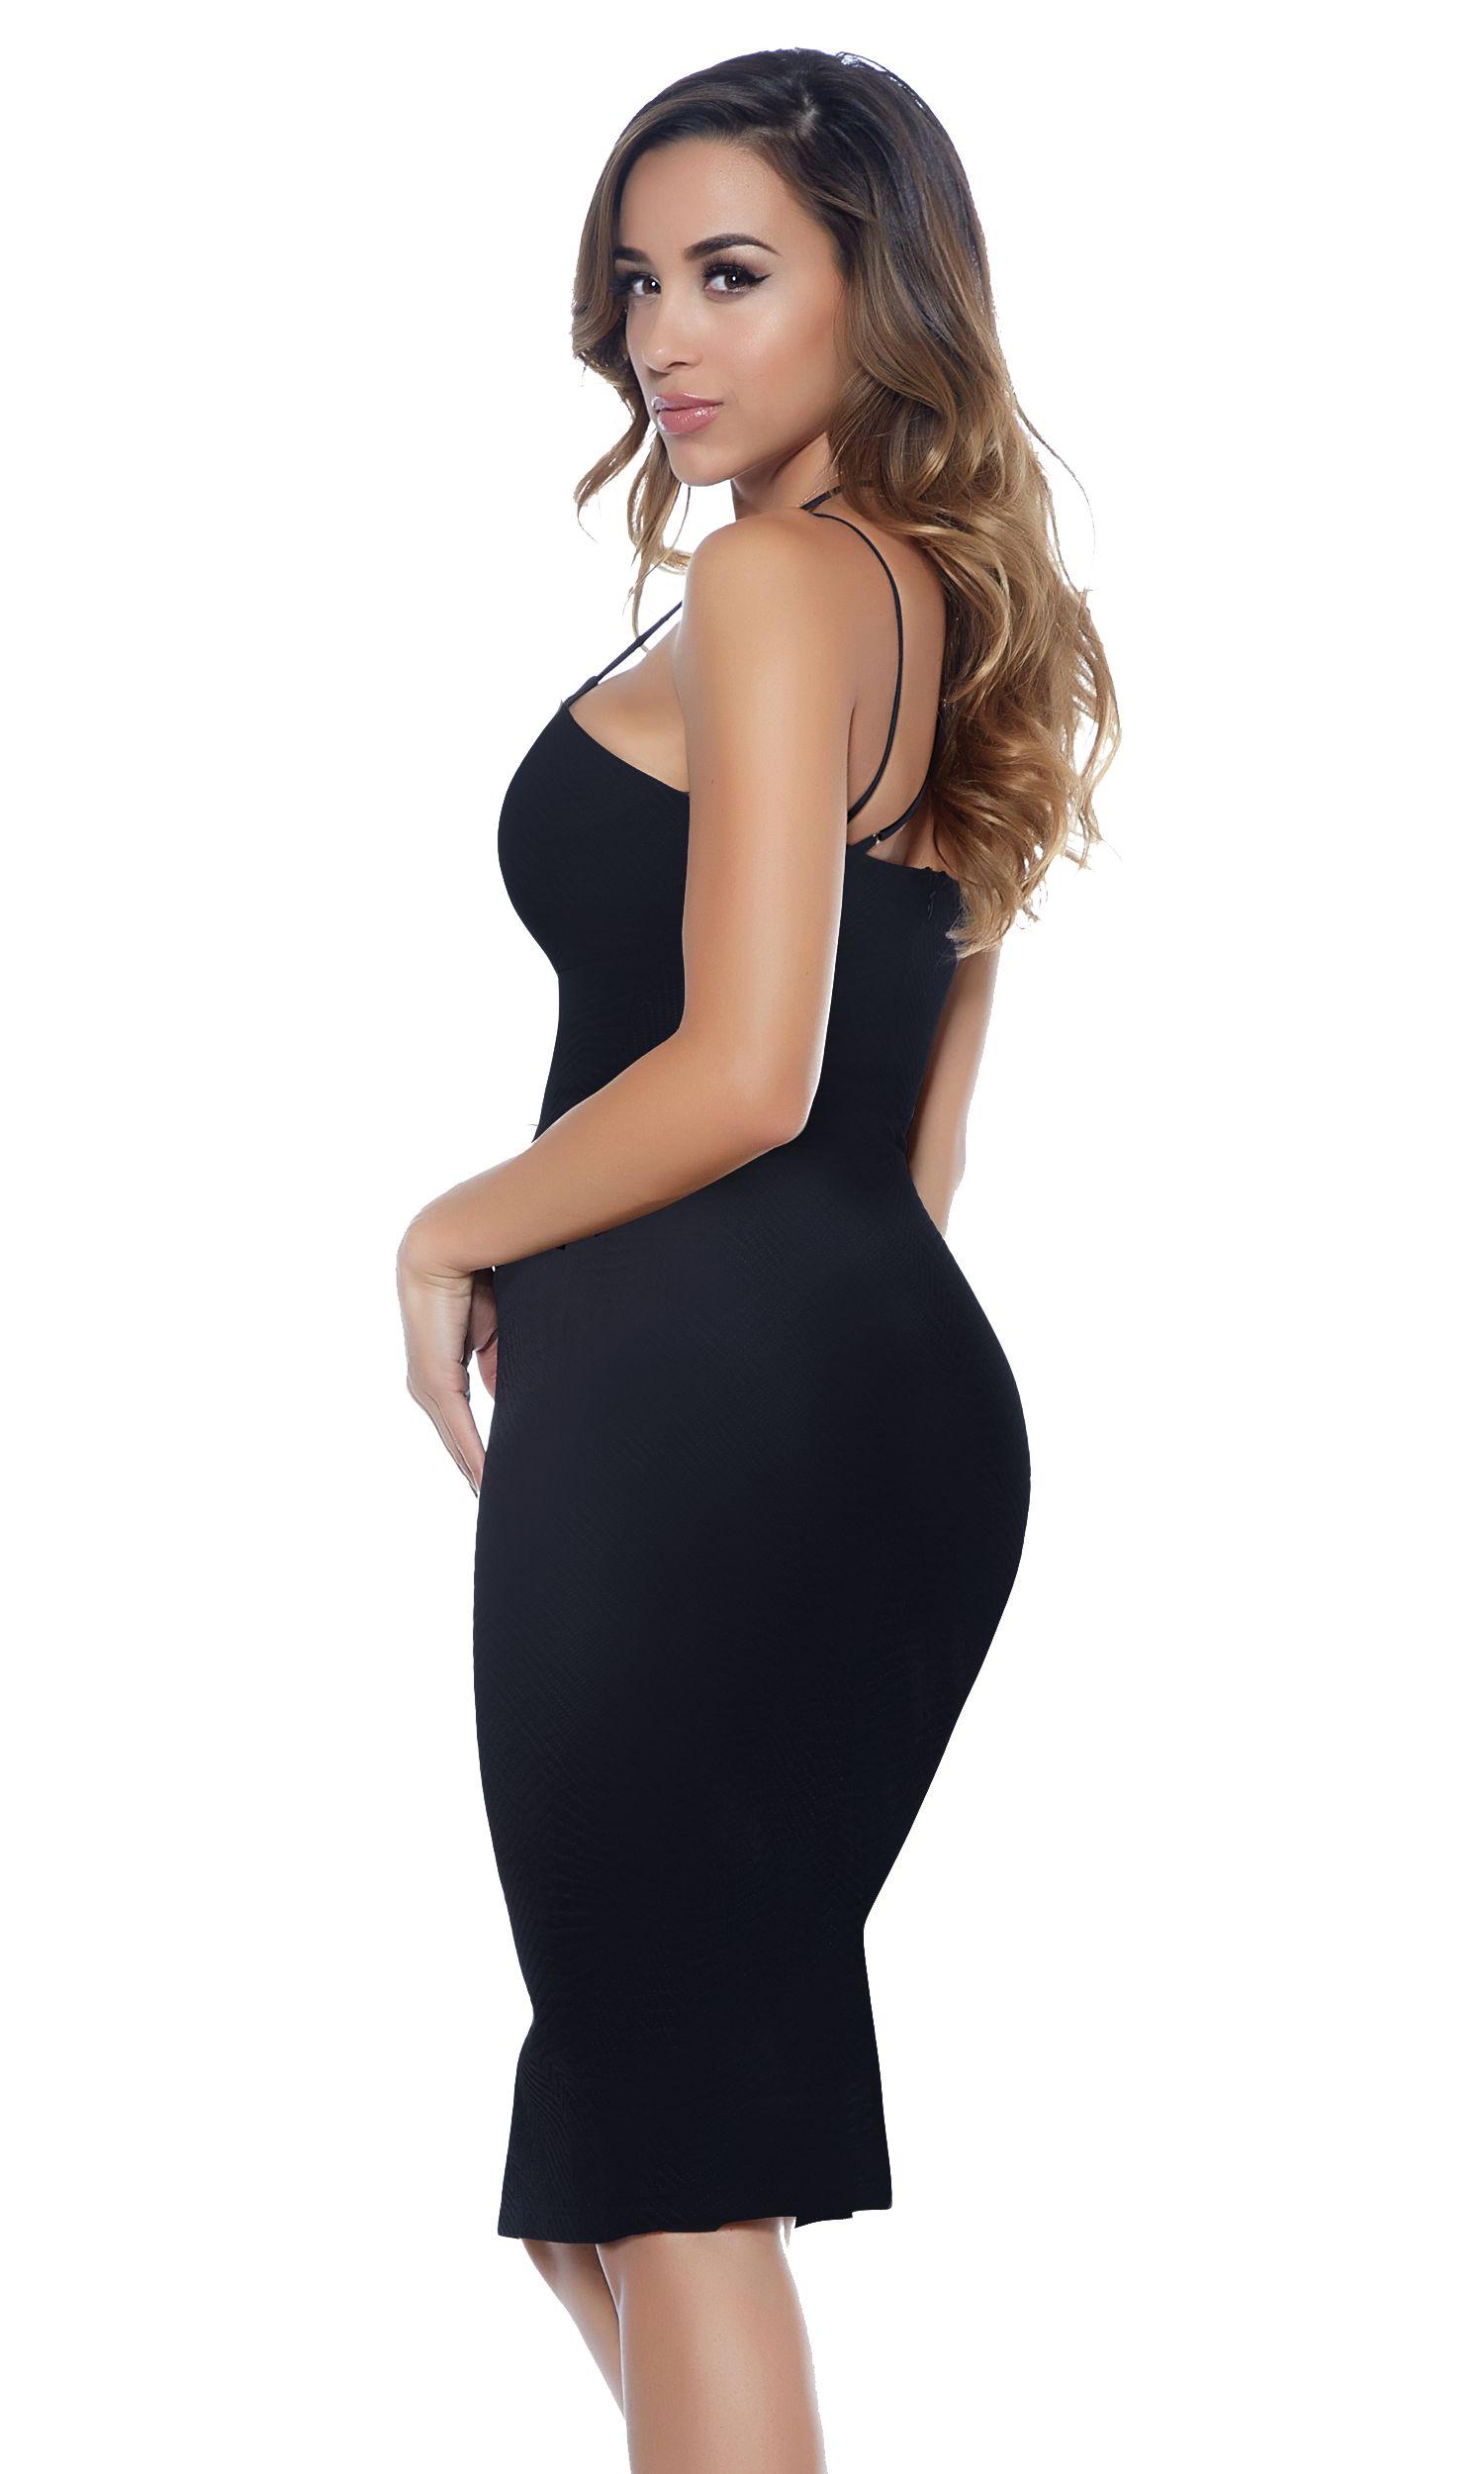 d388b20cbcf4 Ana Cheri - Forplay | Ana Cheri | Dresses, Cut out skater dress y ...